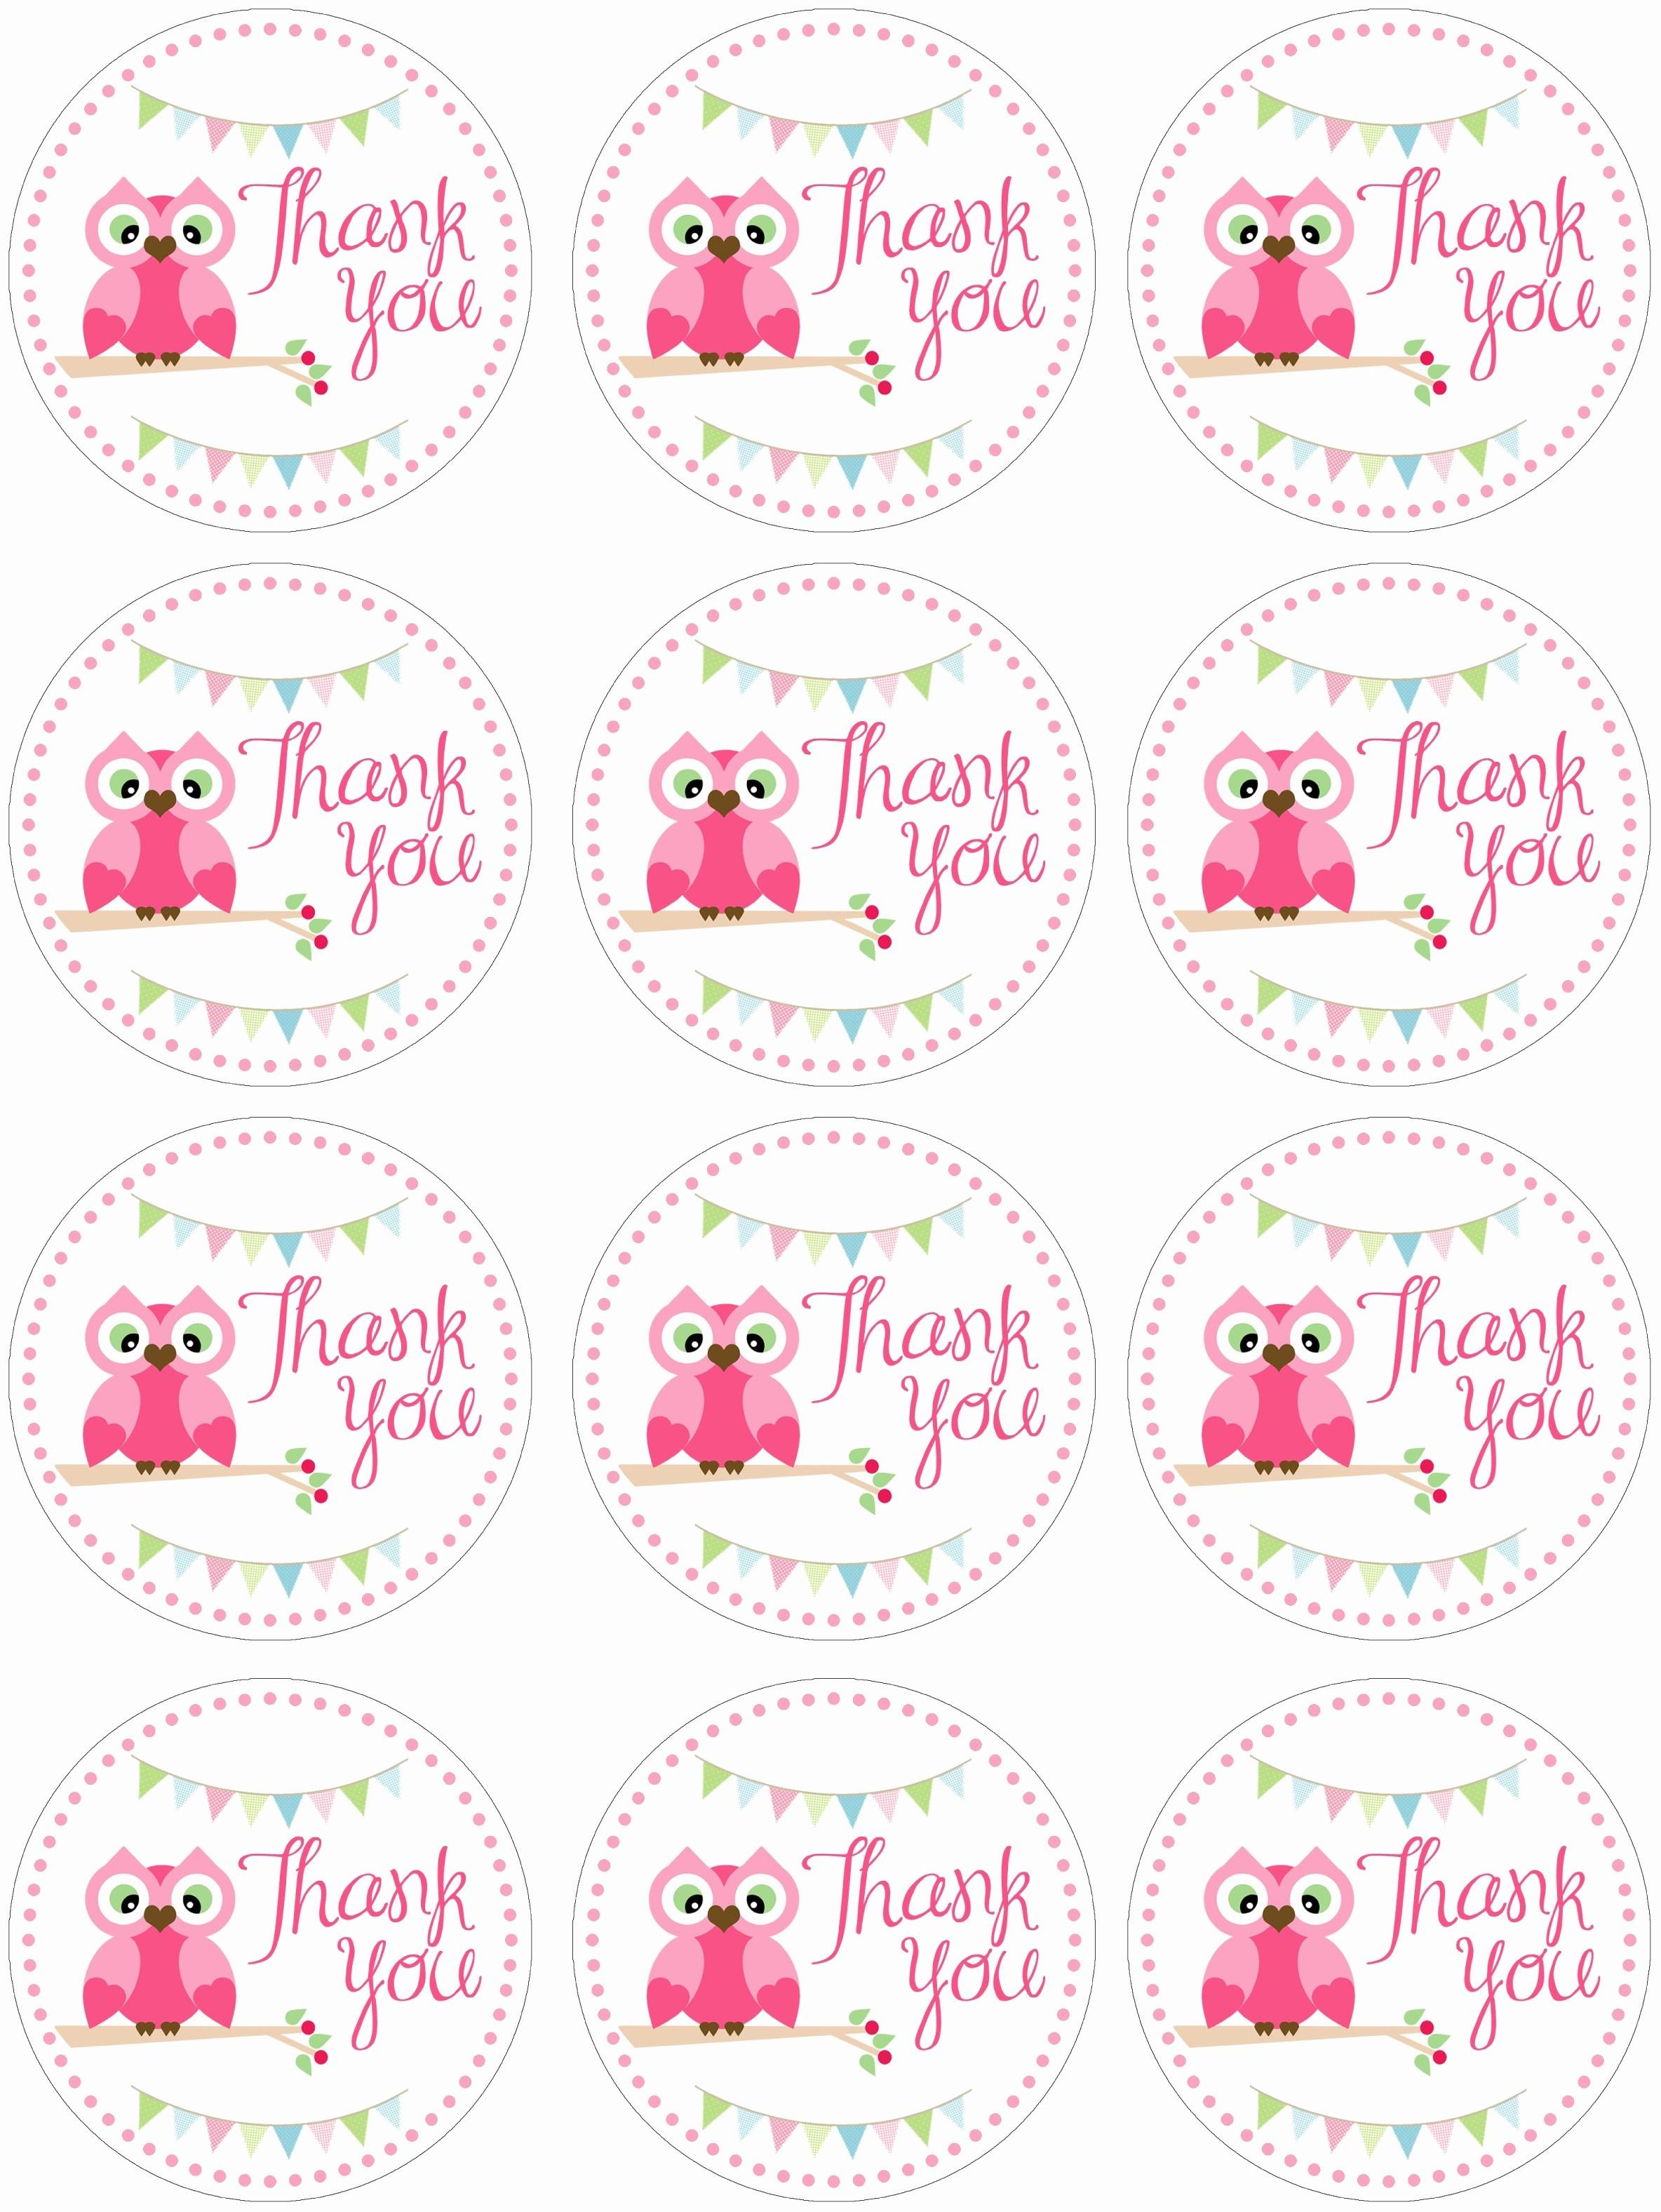 Free Printable Thank You Stickers – Pictimilitude - Free Printable Thank You Tags Template